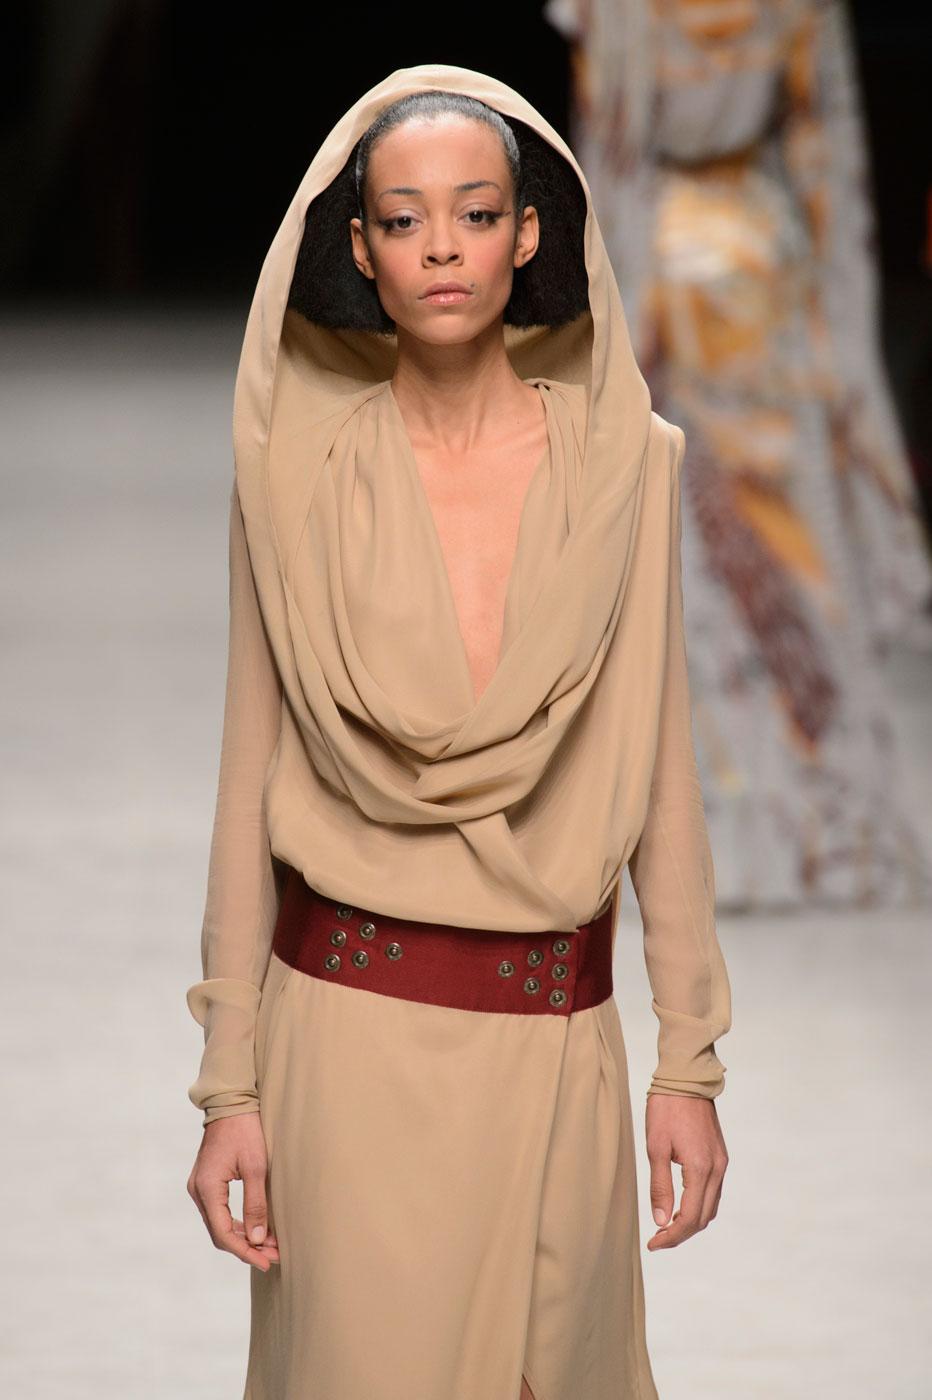 Julien-Fournie-Prive-fashion-runway-show-haute-couture-paris-spring-2015-the-impression-27